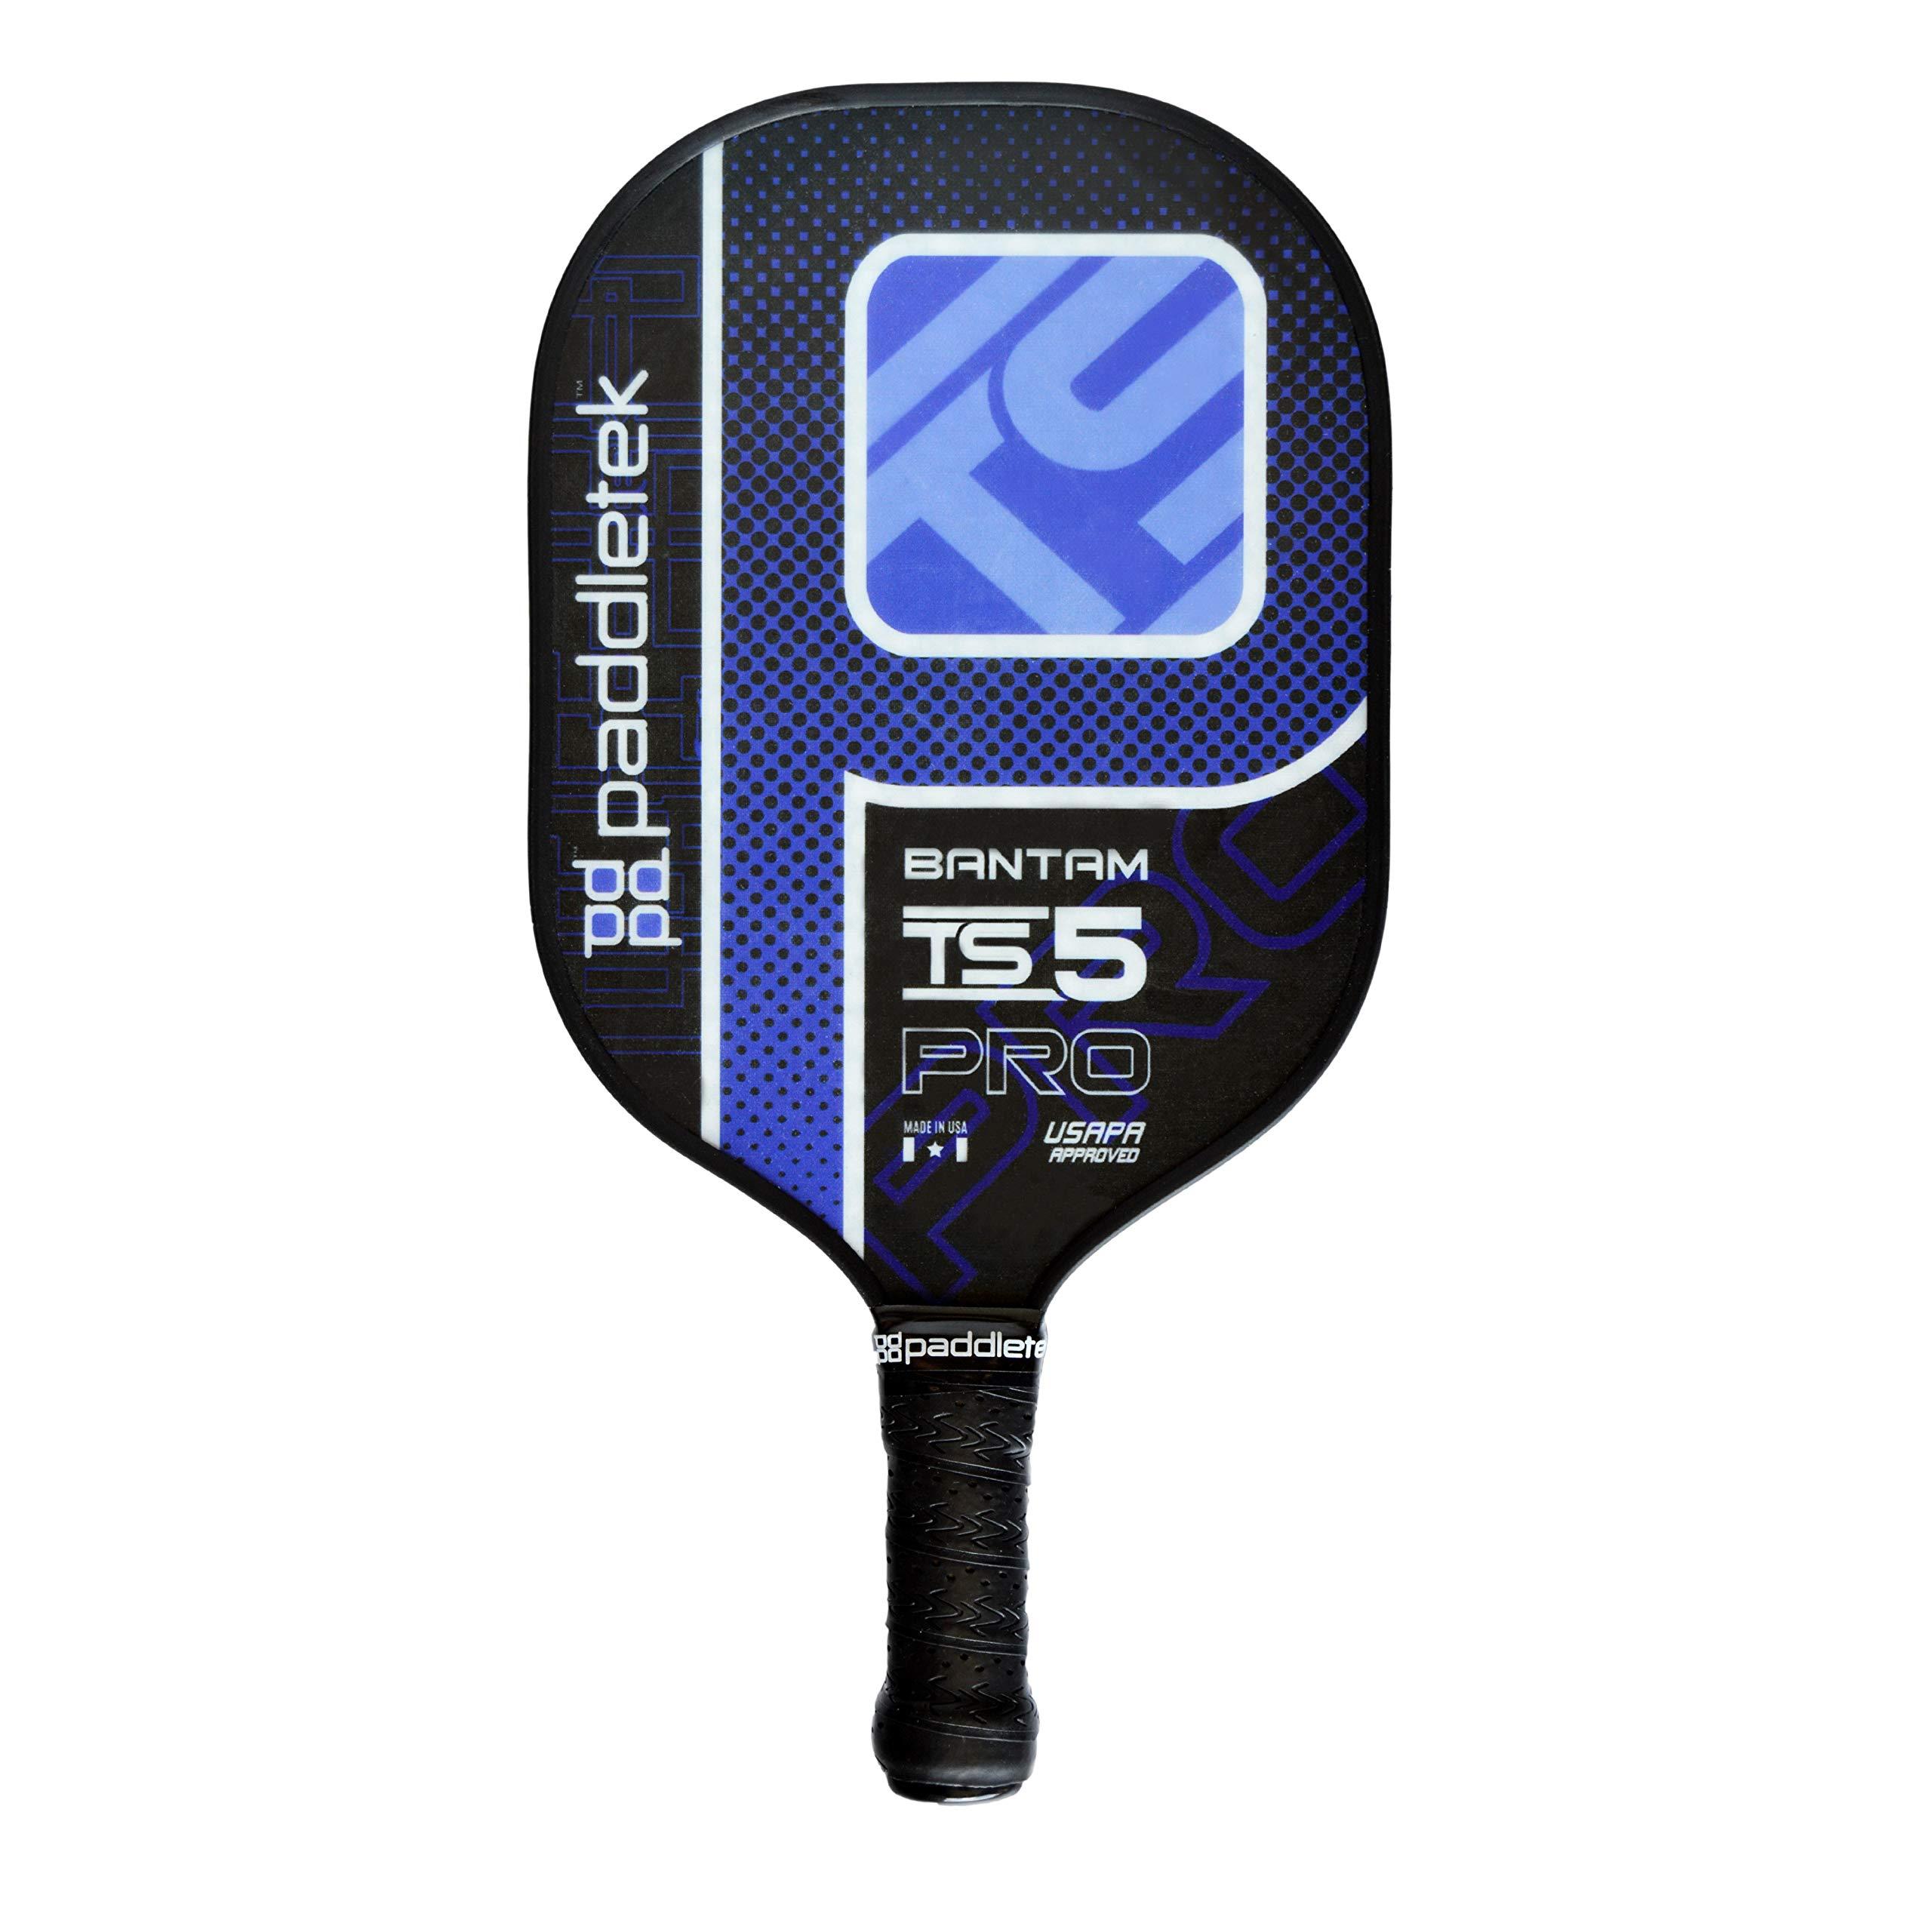 Paddletek Bantam TS-5 Pro Composite - Blue - Large (4 3/8'') - Standard Weight